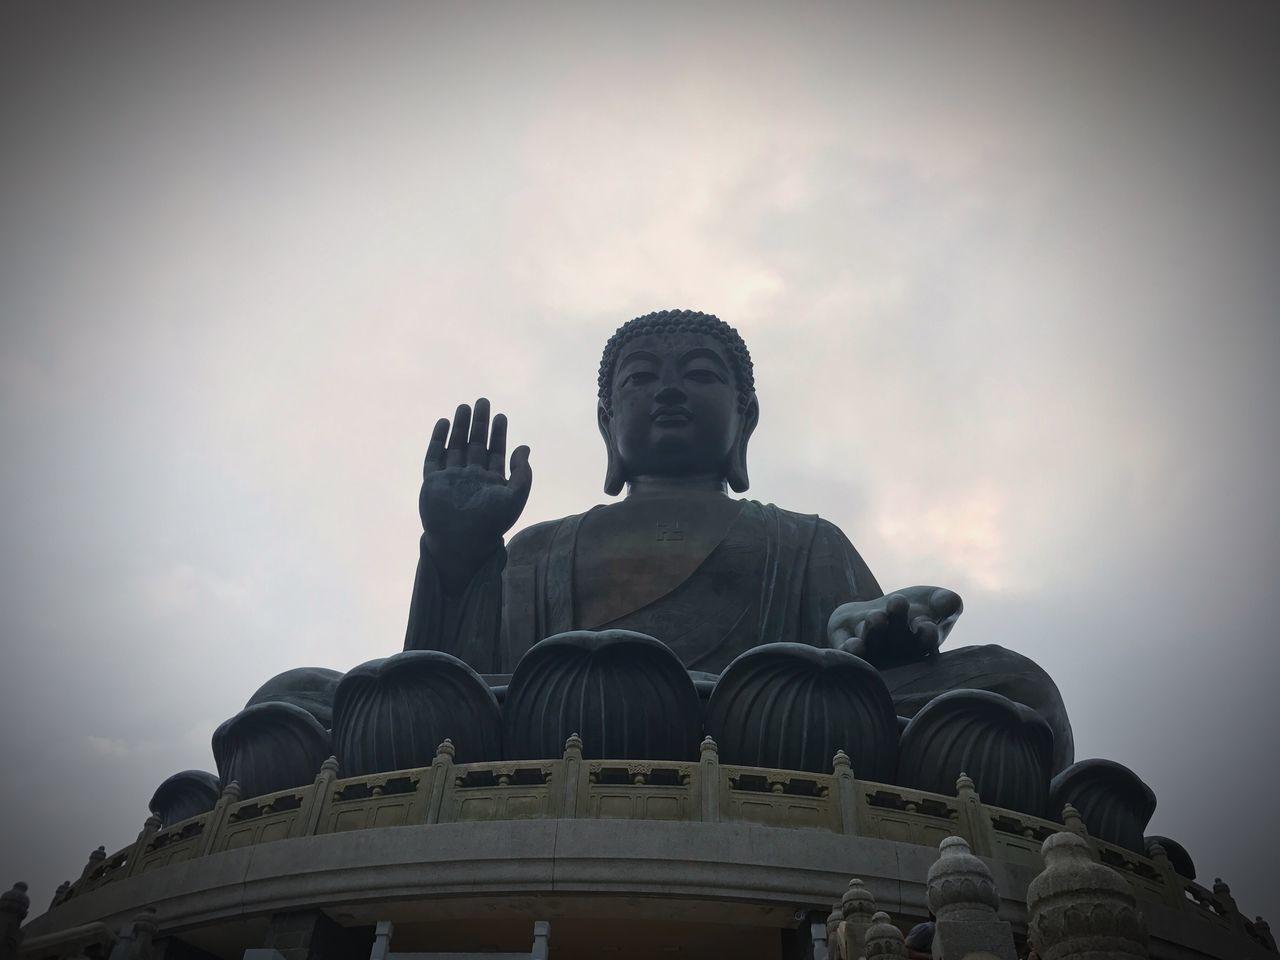 Buddha Buddha Statue Big Buddha Tian Tan Buddha (Giant Buddha) 天壇大佛 Travel